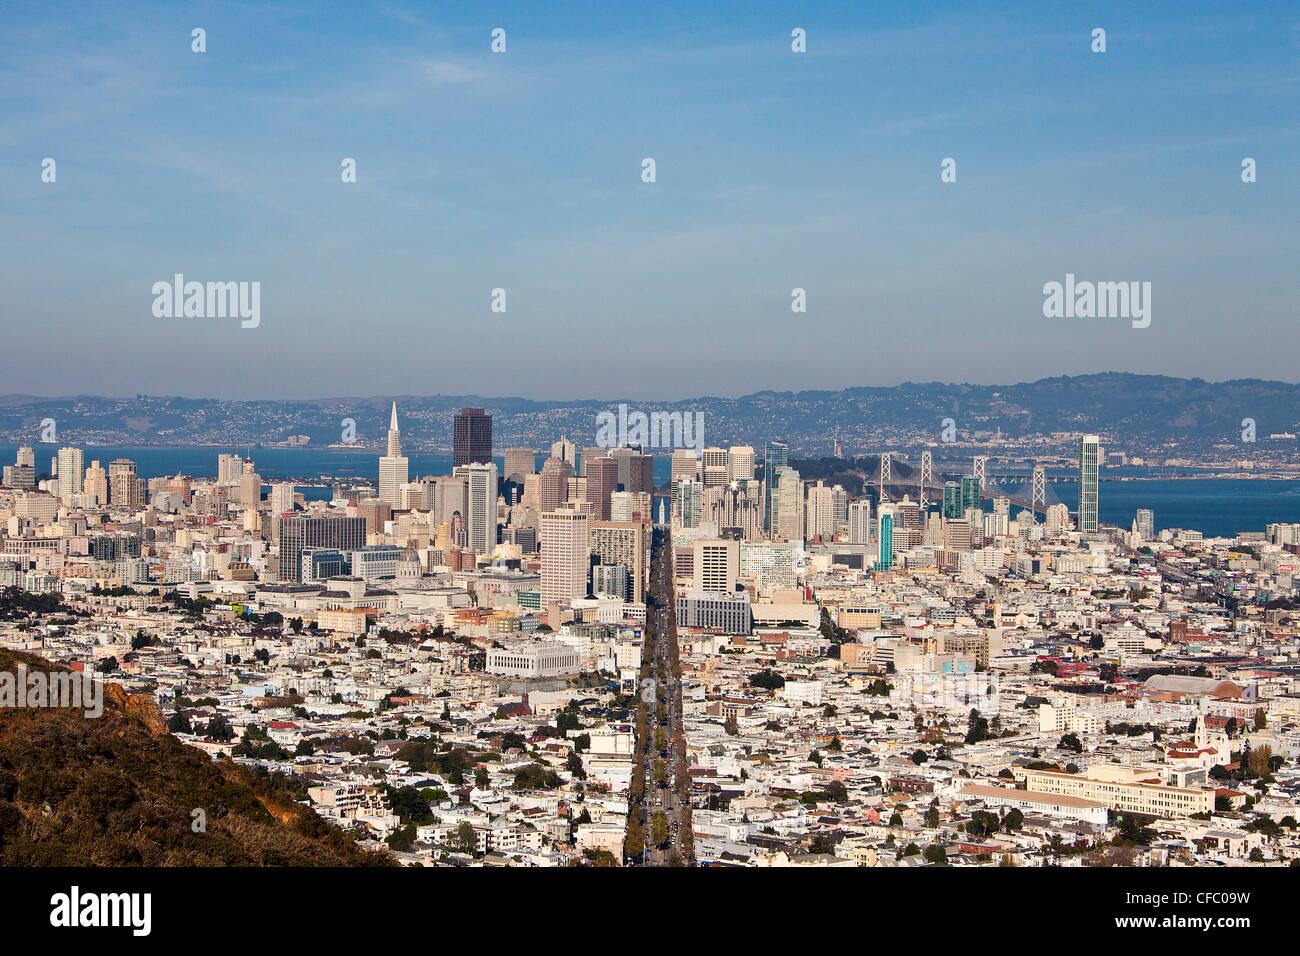 USA, USA, Amerika, Kalifornien, San Francisco, Stadt, Innenstadt, Market Street, Architektur, Bucht, Innenstadt, Stockbild